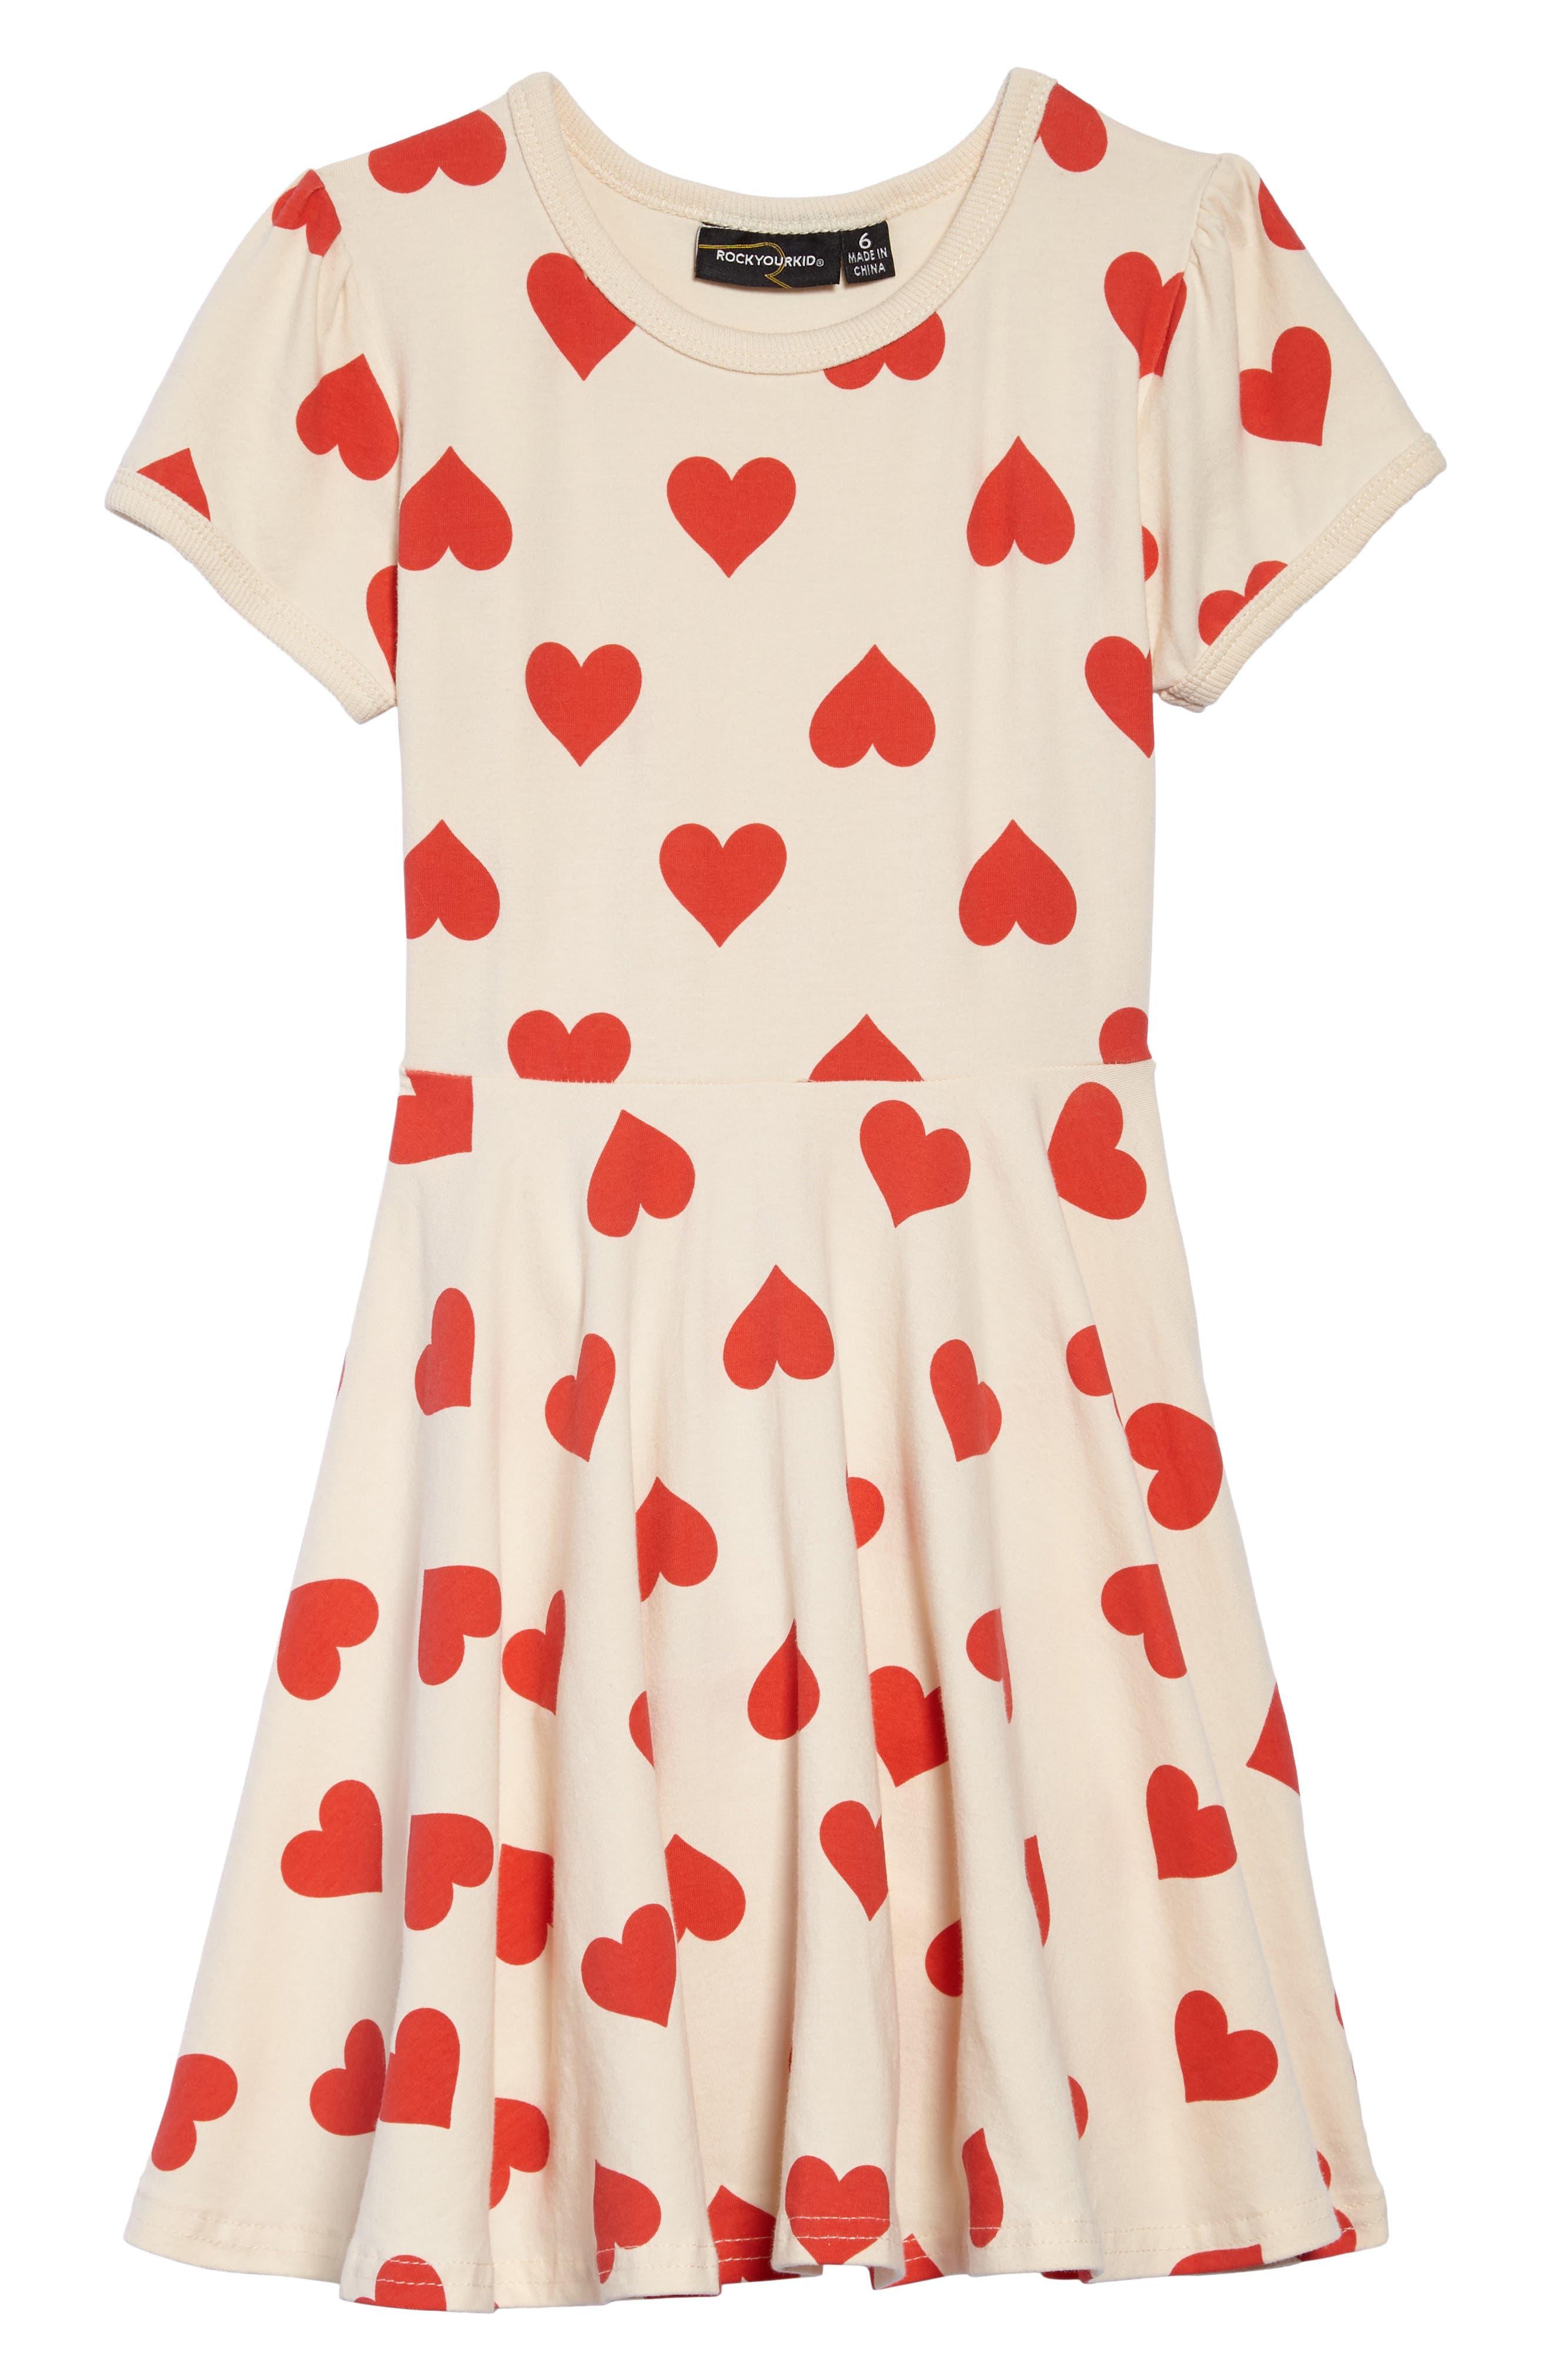 Main Image - Rock Your Kid Sweetheart Dress (Toddler Girls & Little Girls)